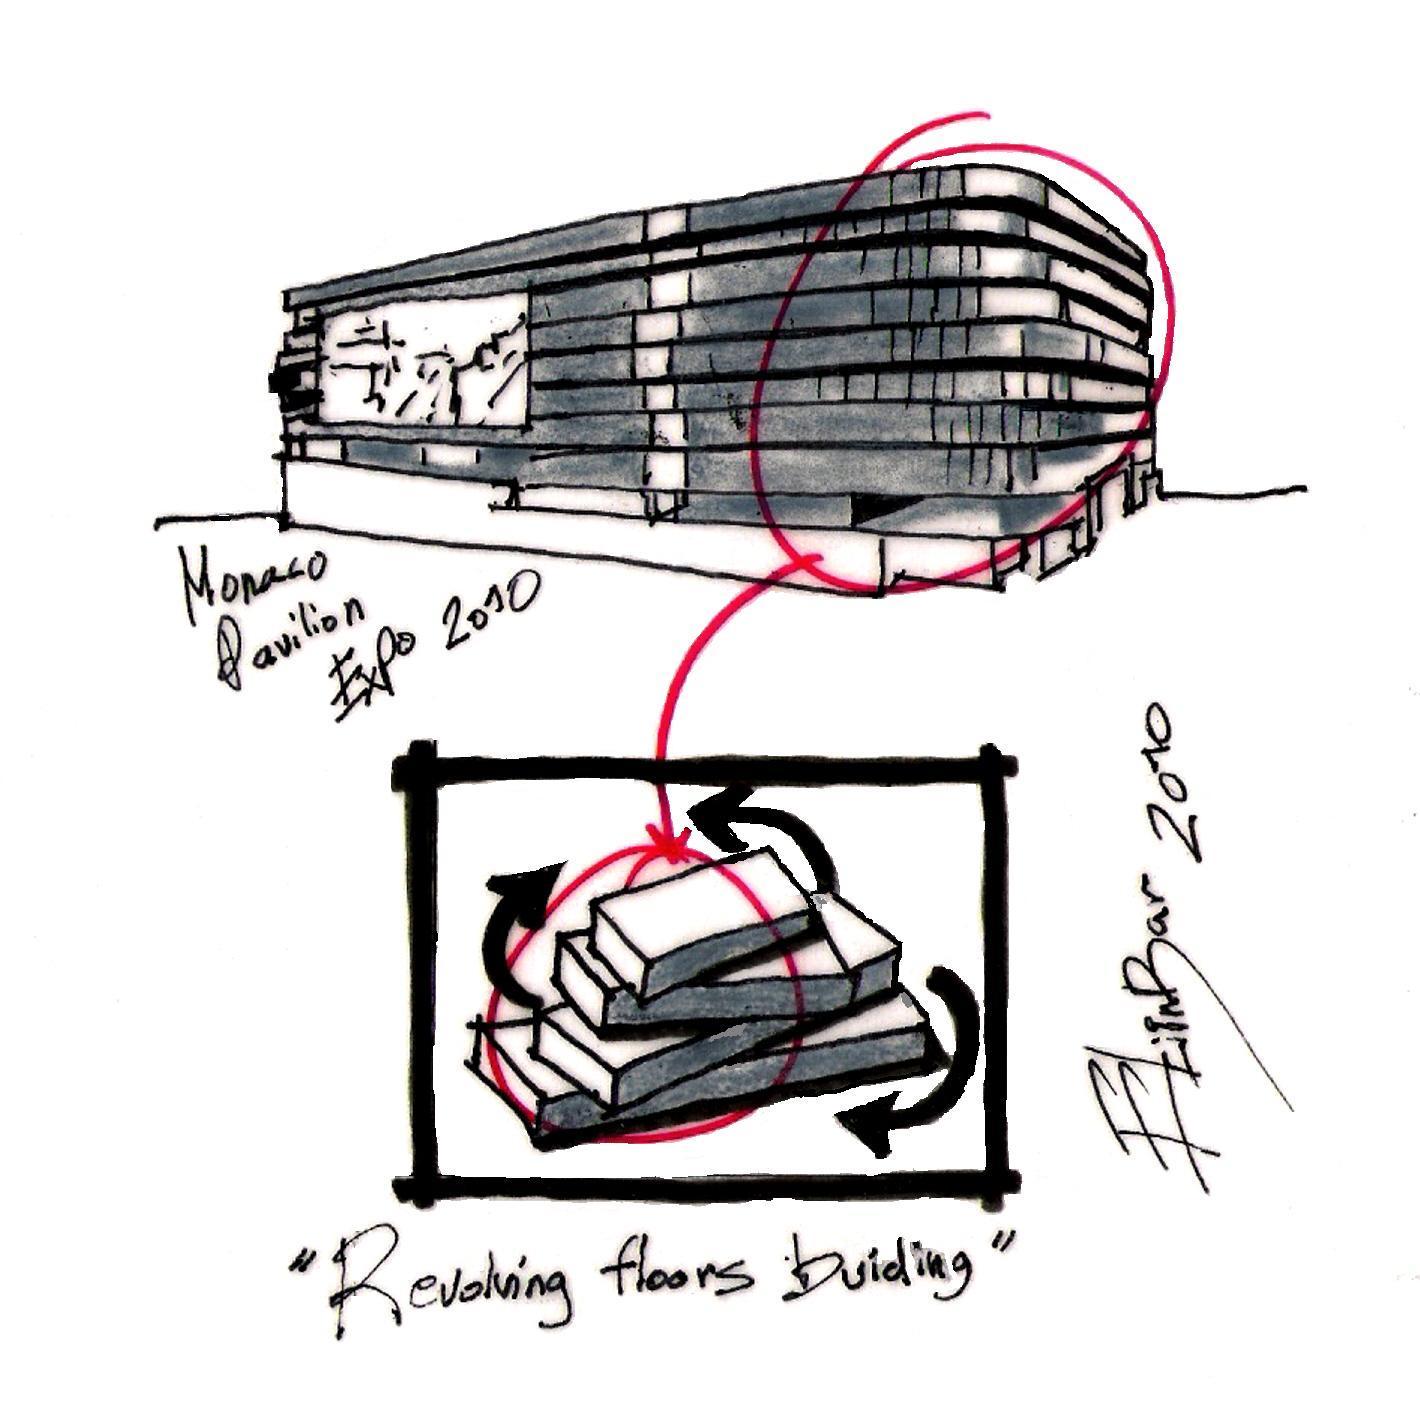 the-revolving-floors-building_monaco-pavilion-expo-2010